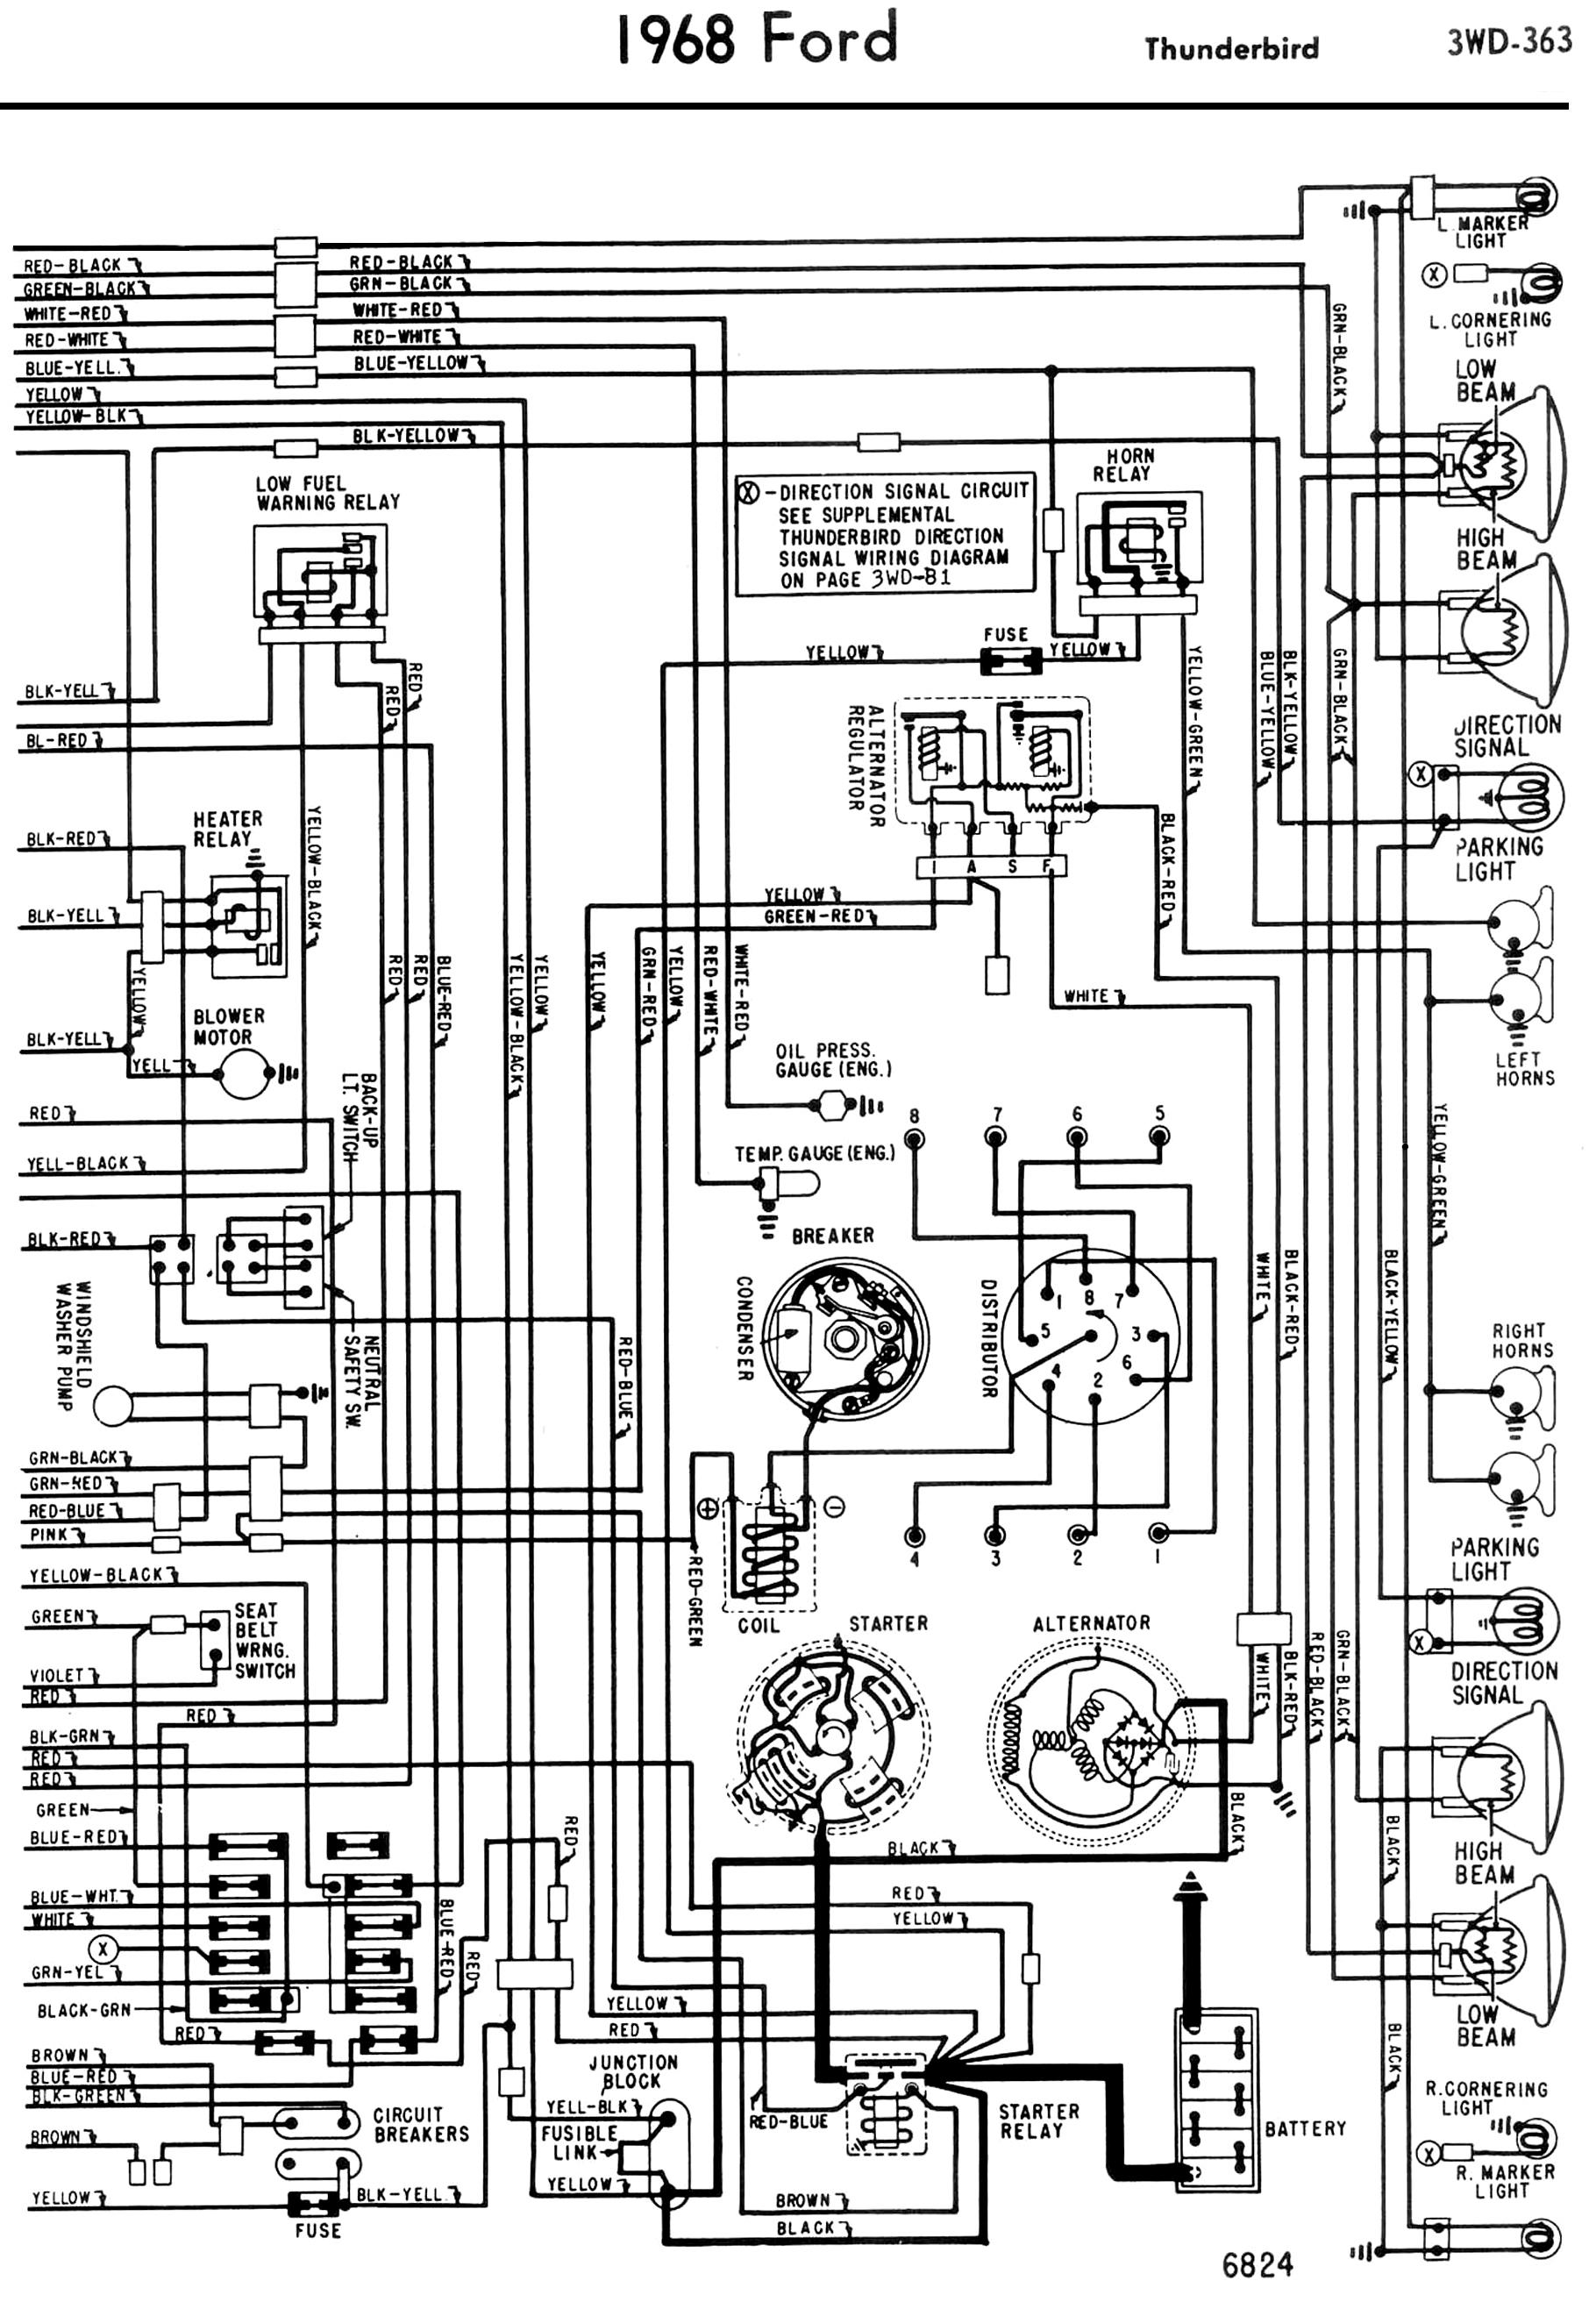 1968 ford headlight switch wiring diagram porsche cayenne diagrams 2003 chevy impala dimmer